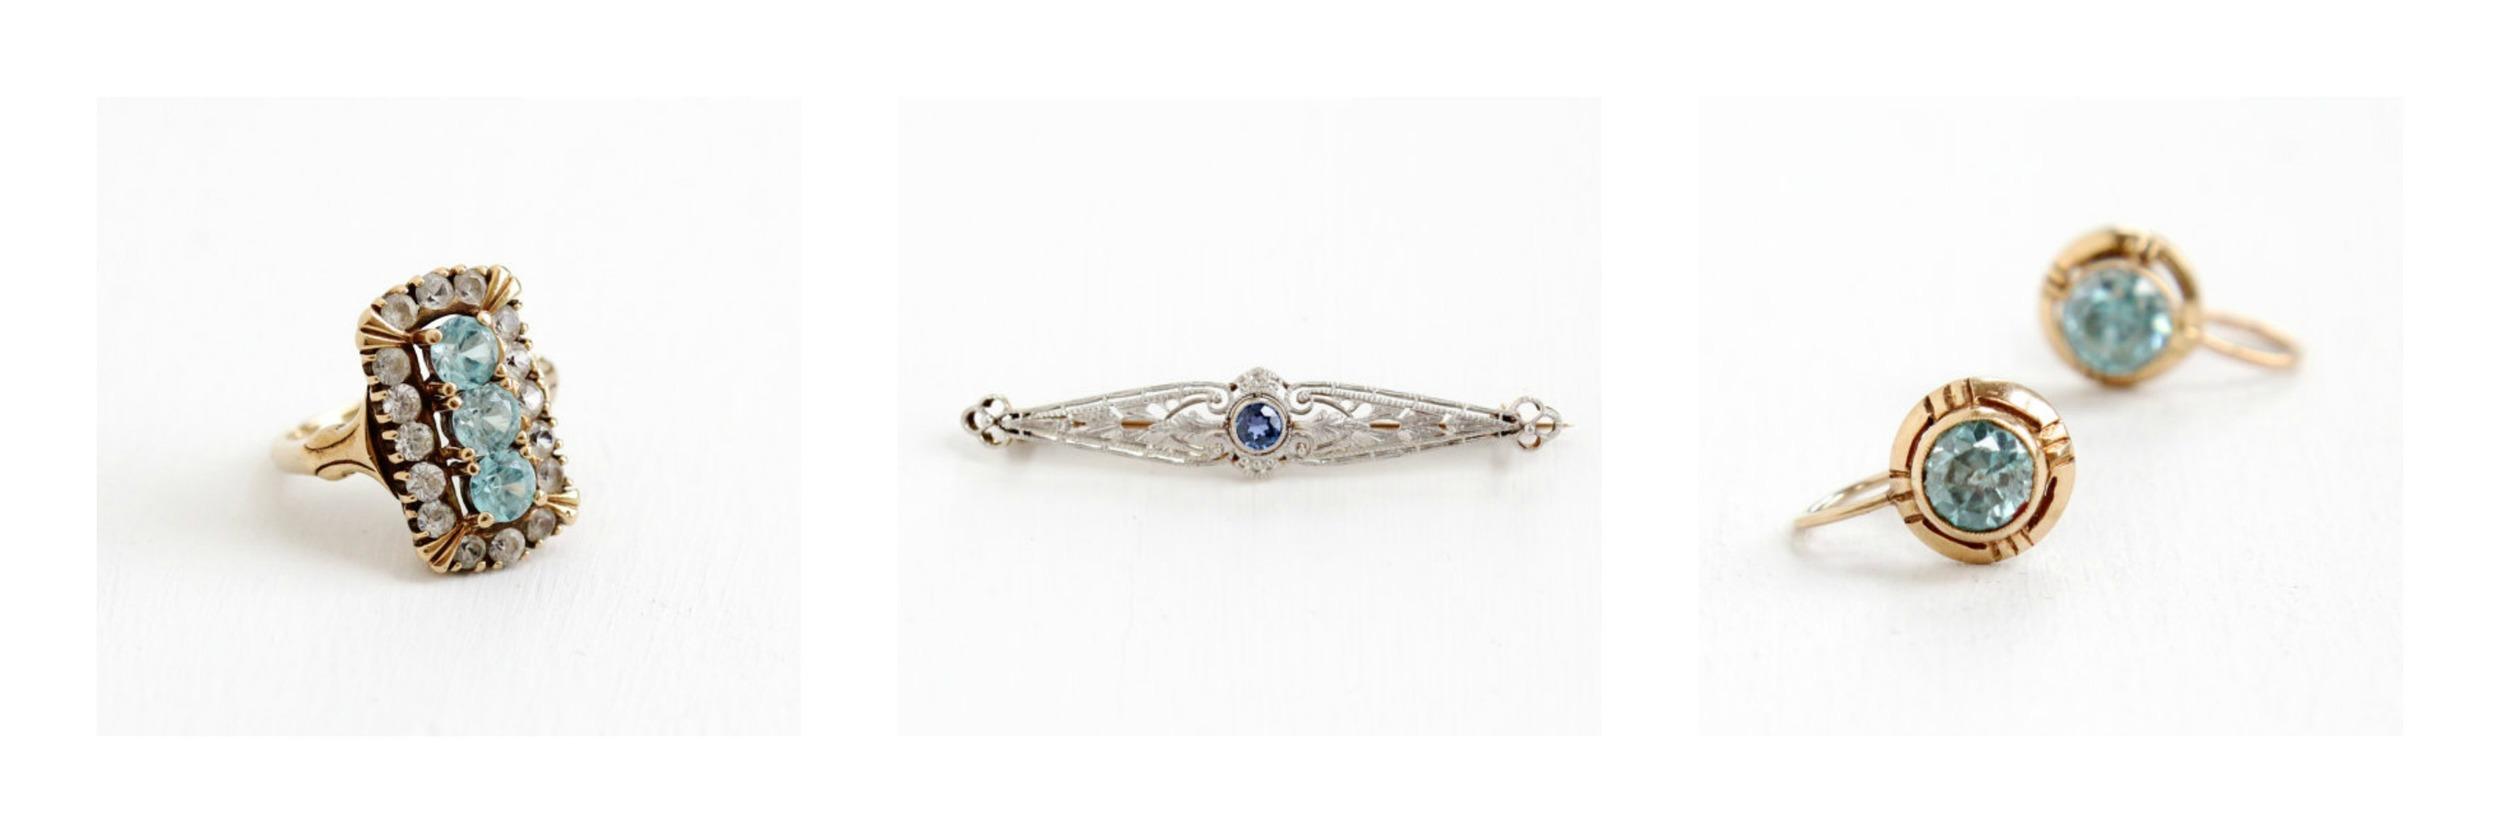 Vintage Genuine Zircon Ring ,Antique Genuine  Sapphire Pin ,Vintage  Zircon Earrings